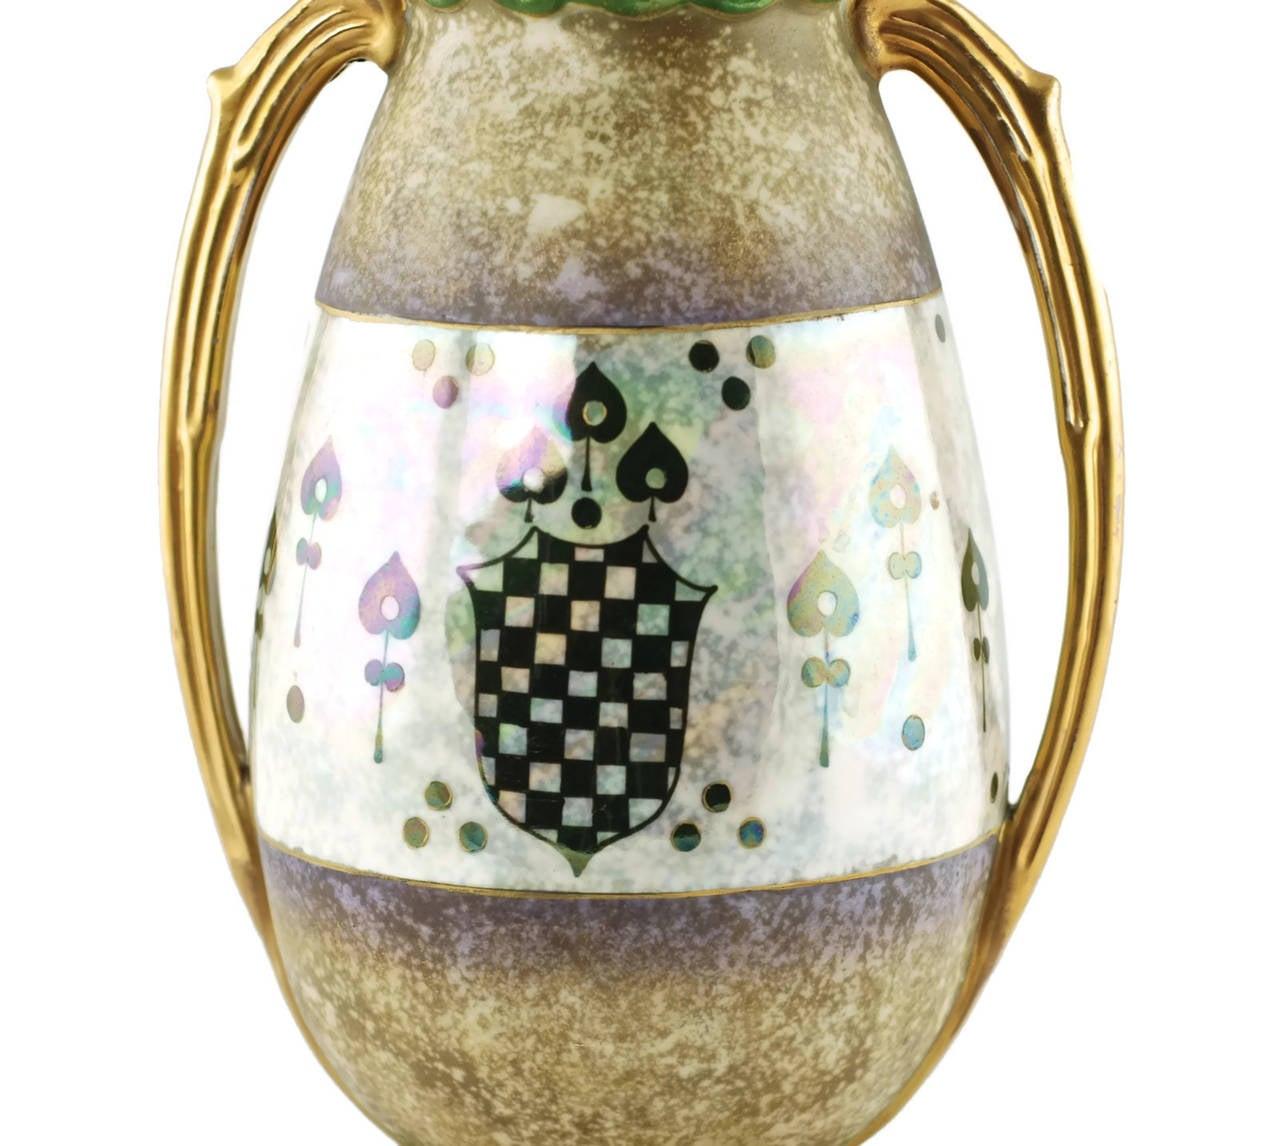 Austrian Riessner & Kessel Amphora Turn Teplitz Two-Handled Vase with Iridized Glaze For Sale